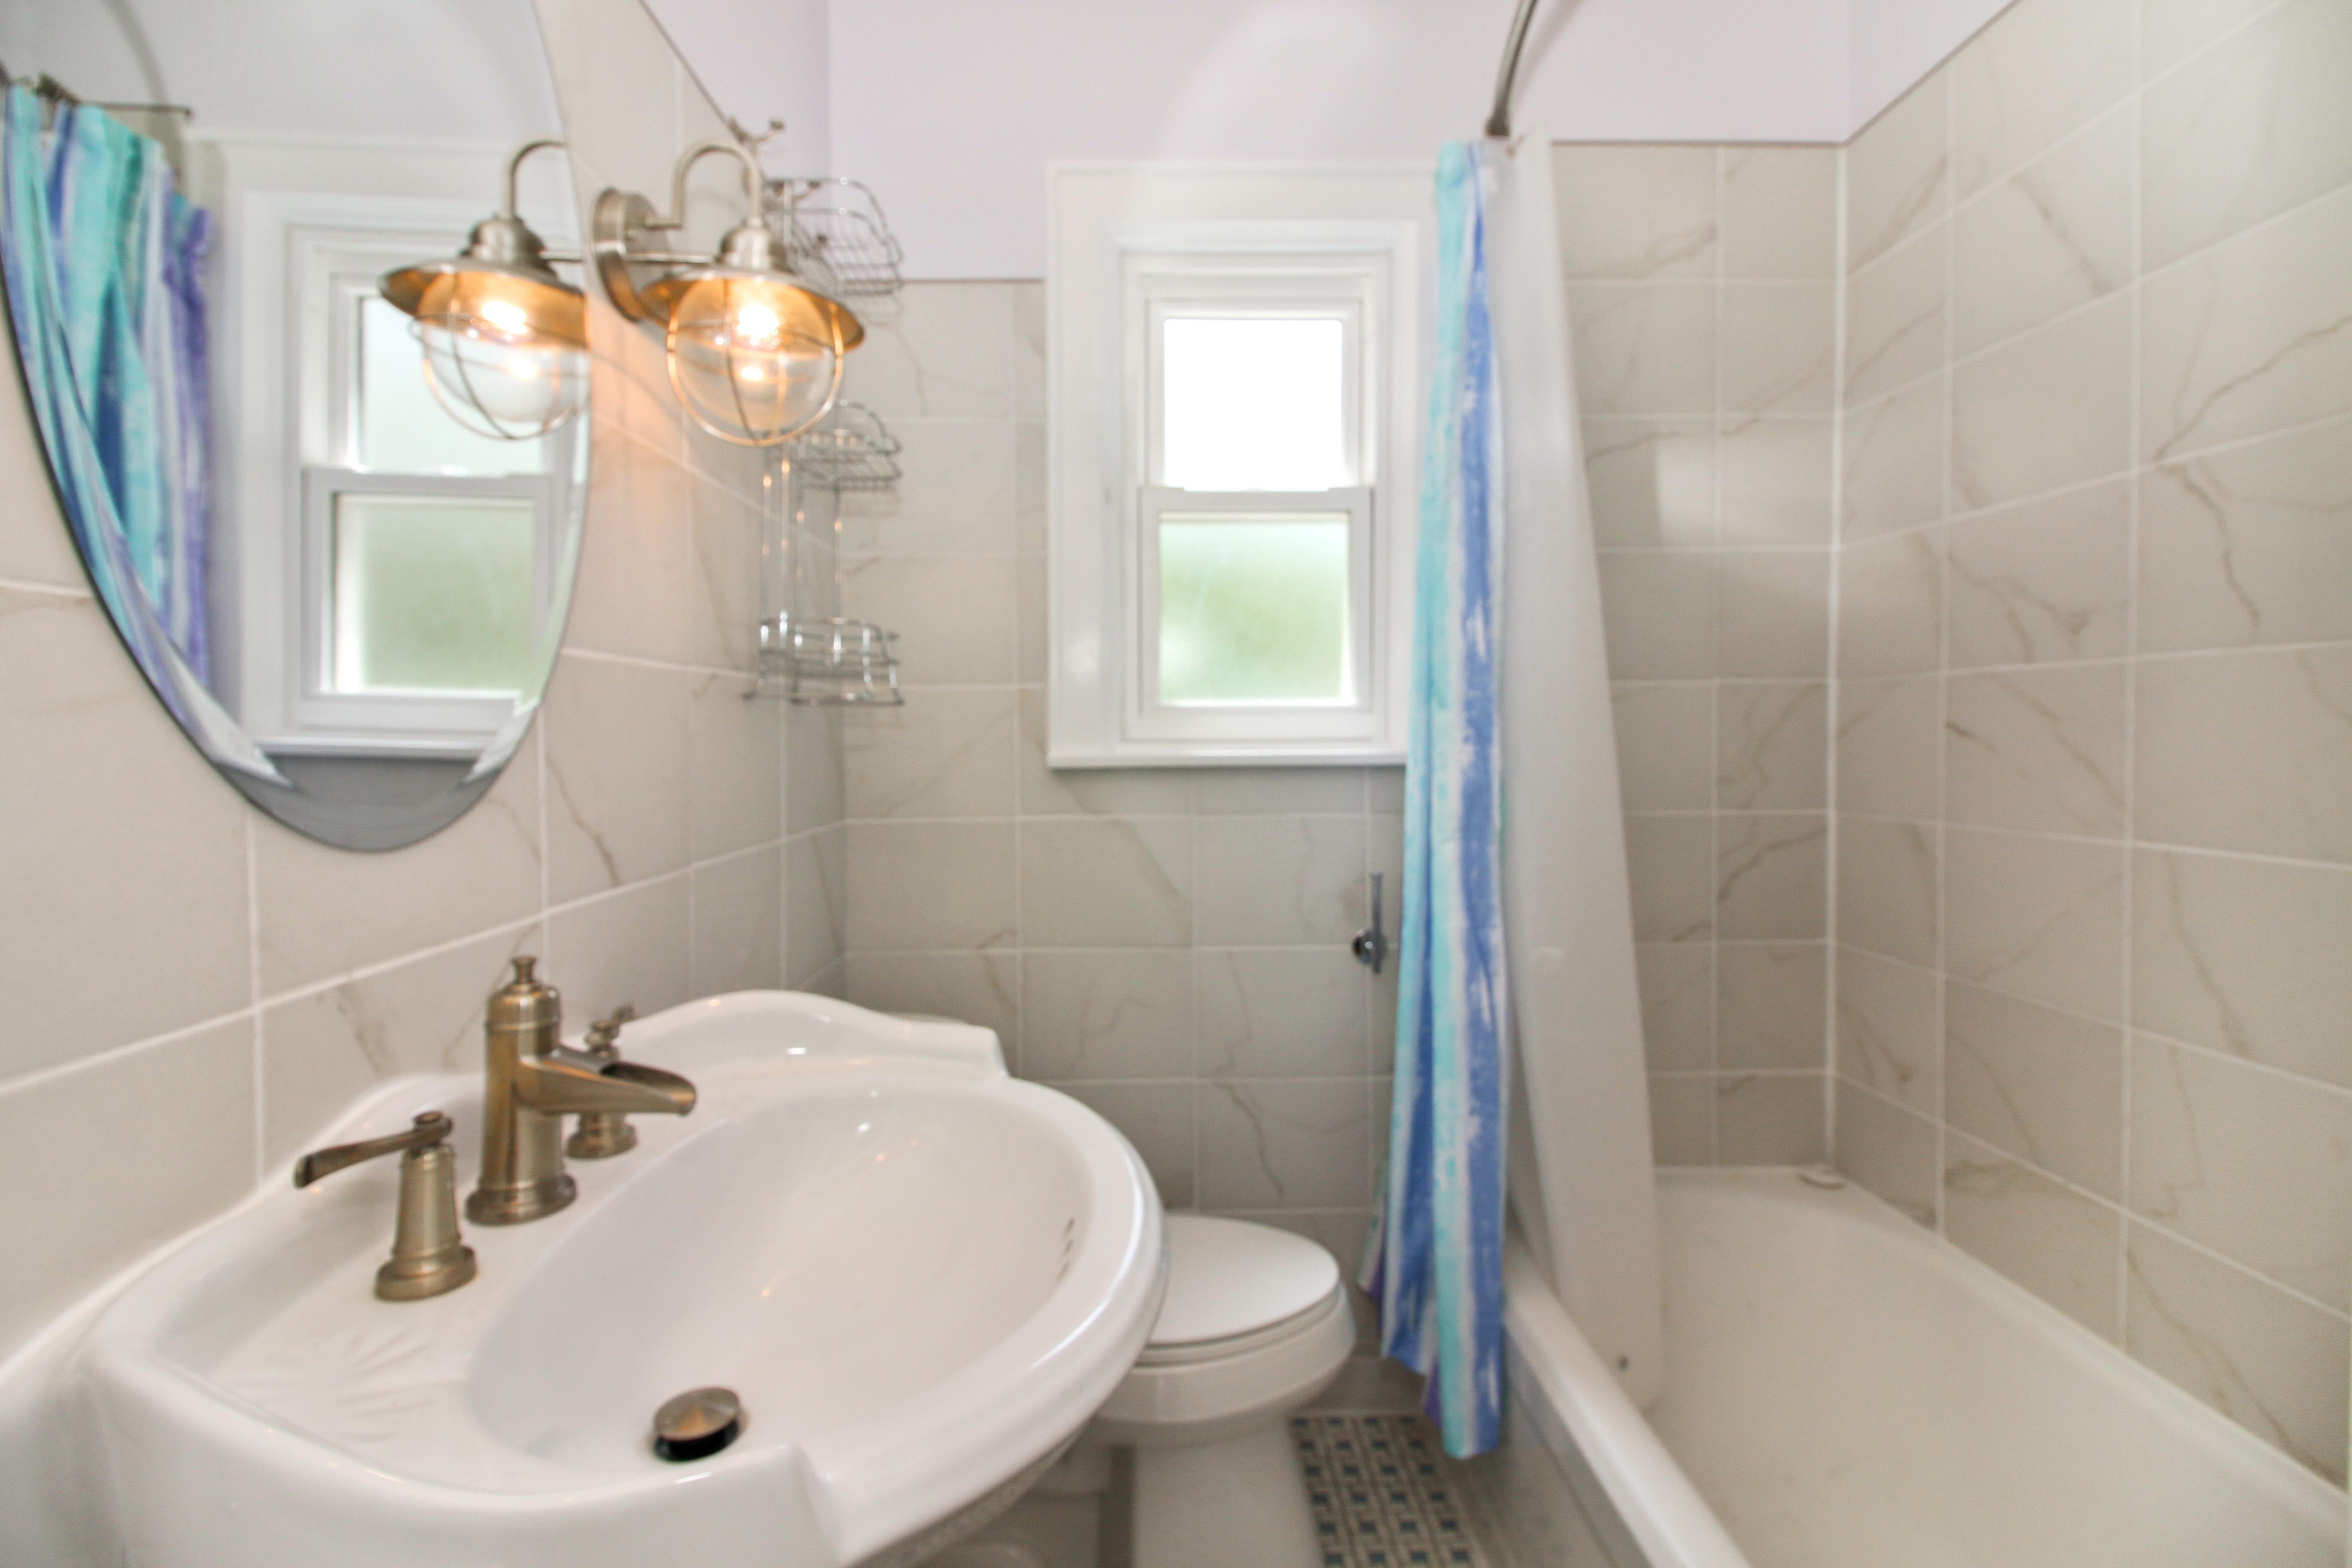 07_1944BluffLn_8_Bathroom_HiRes.jpg